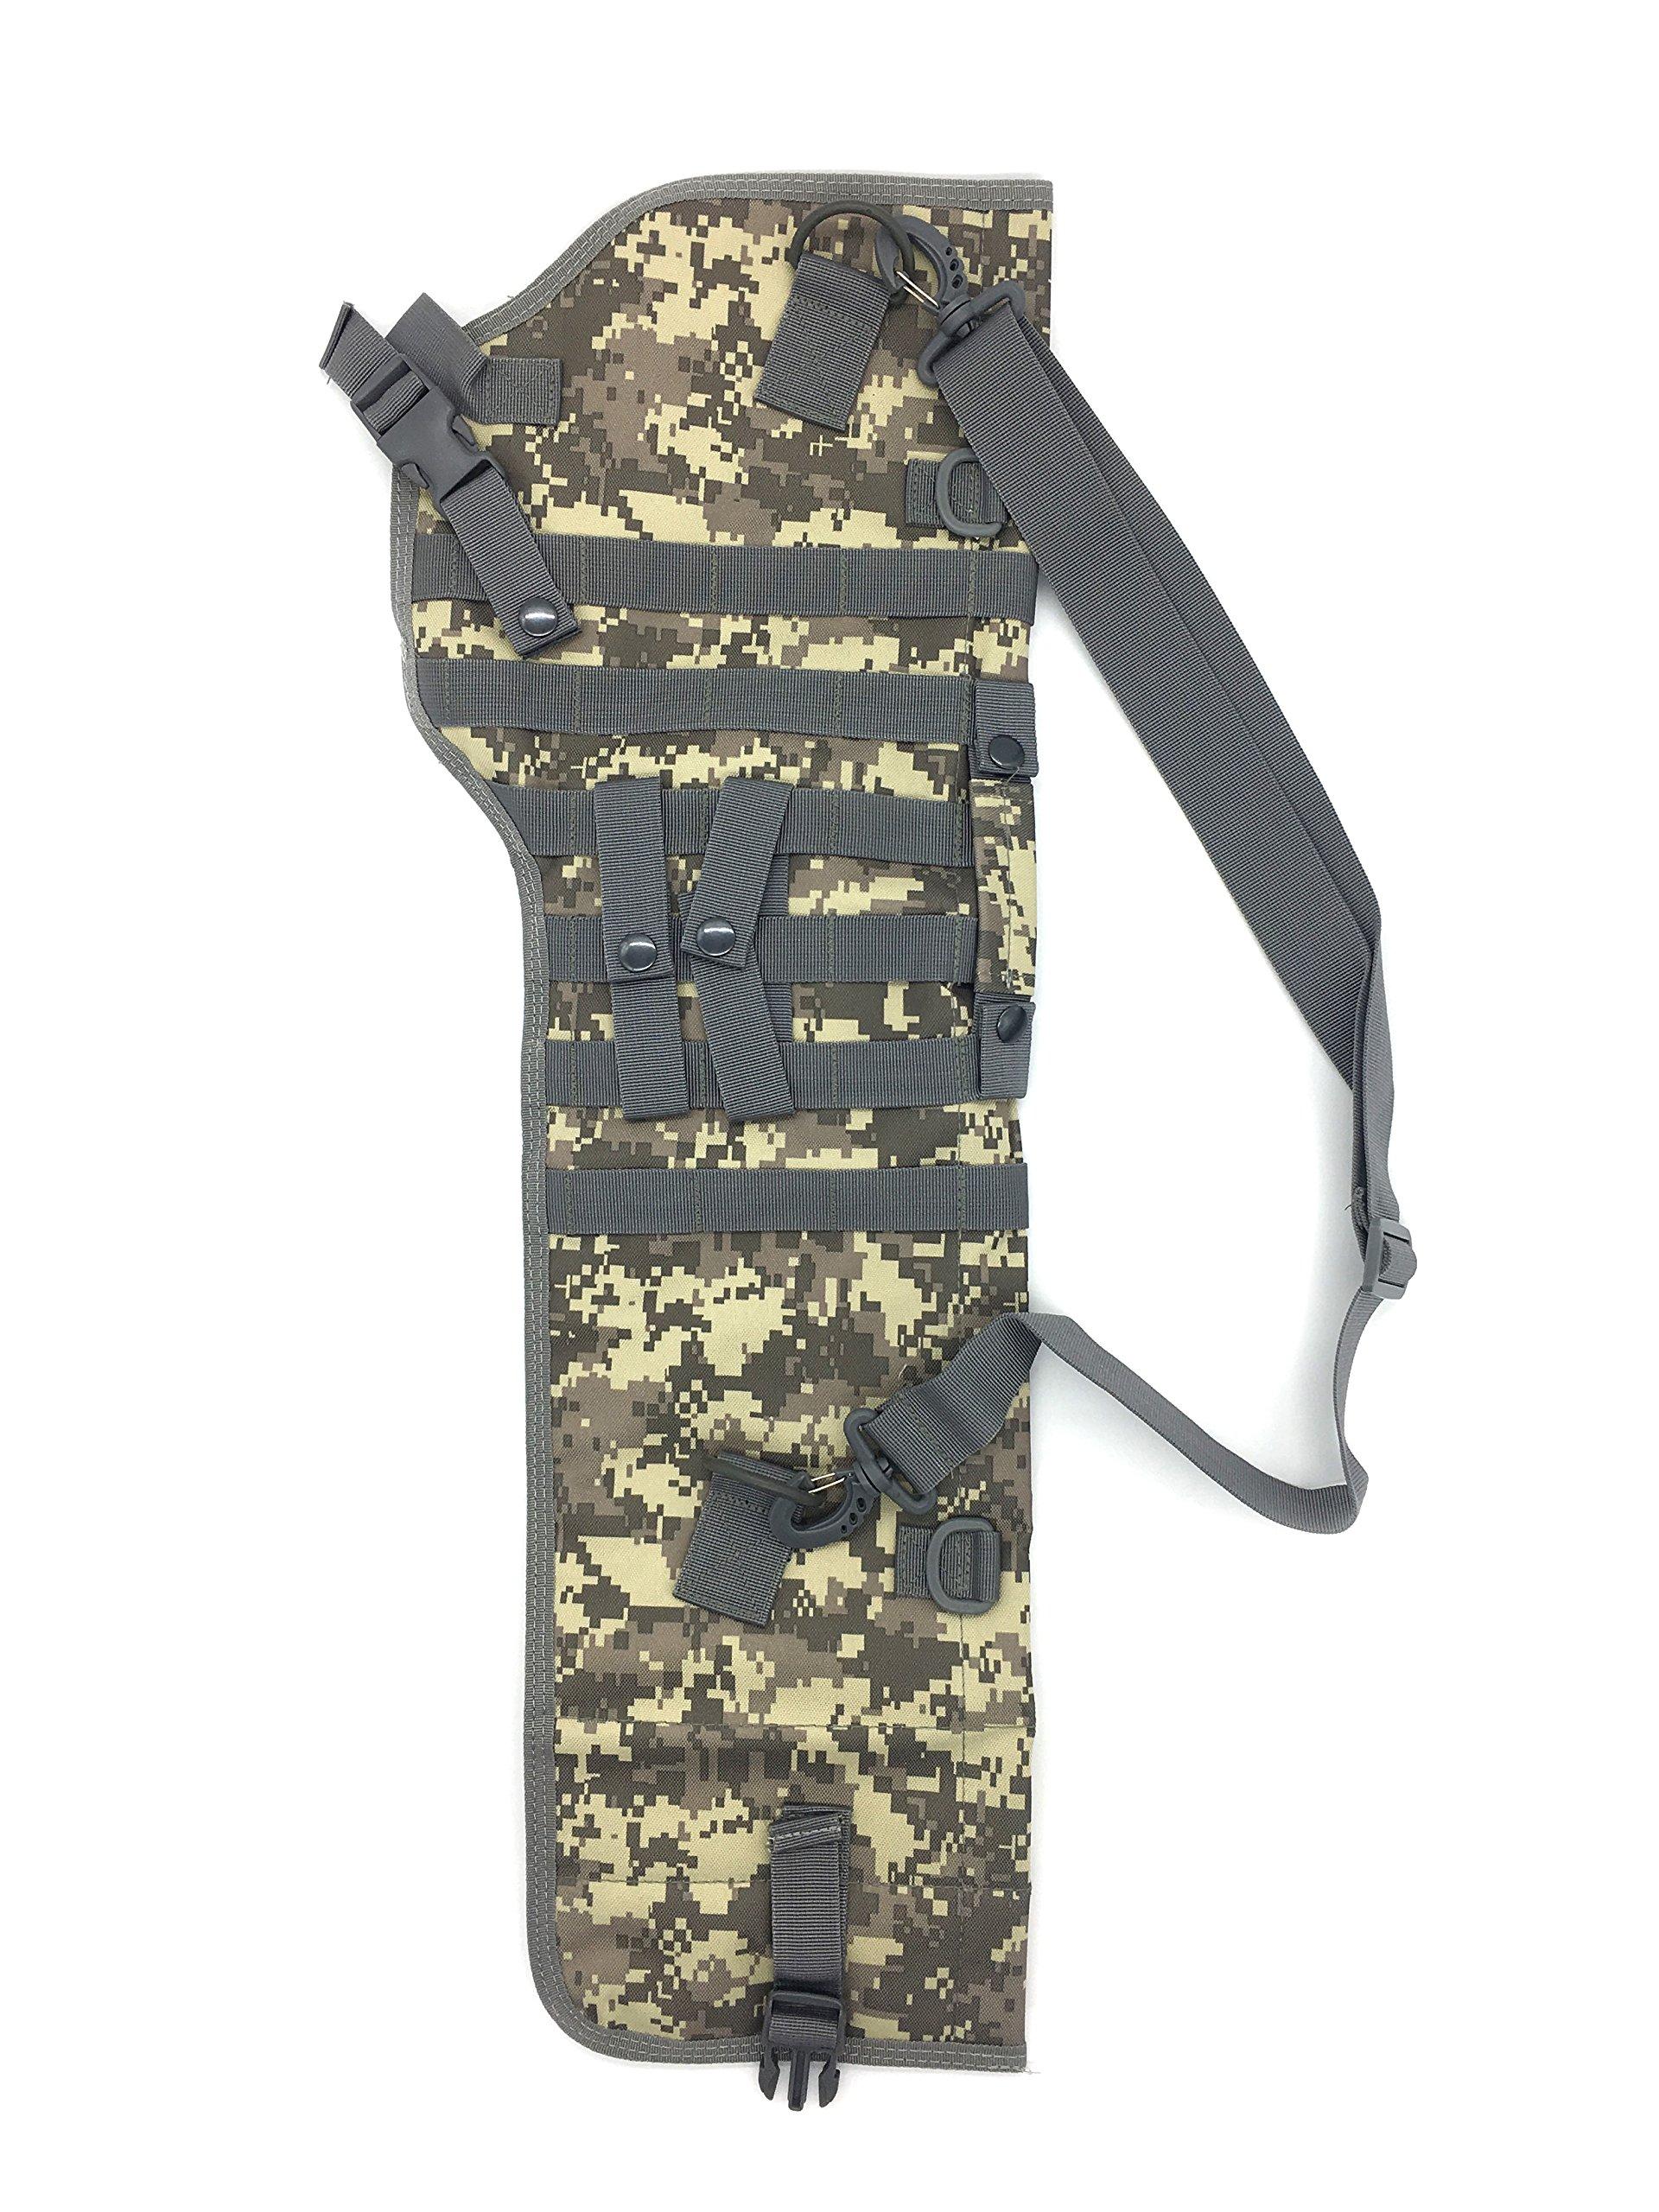 Silfrae Tactical Shotgun Rifle Scabbard Bag Shoulder Bag (Digital Camo) by Silfrae